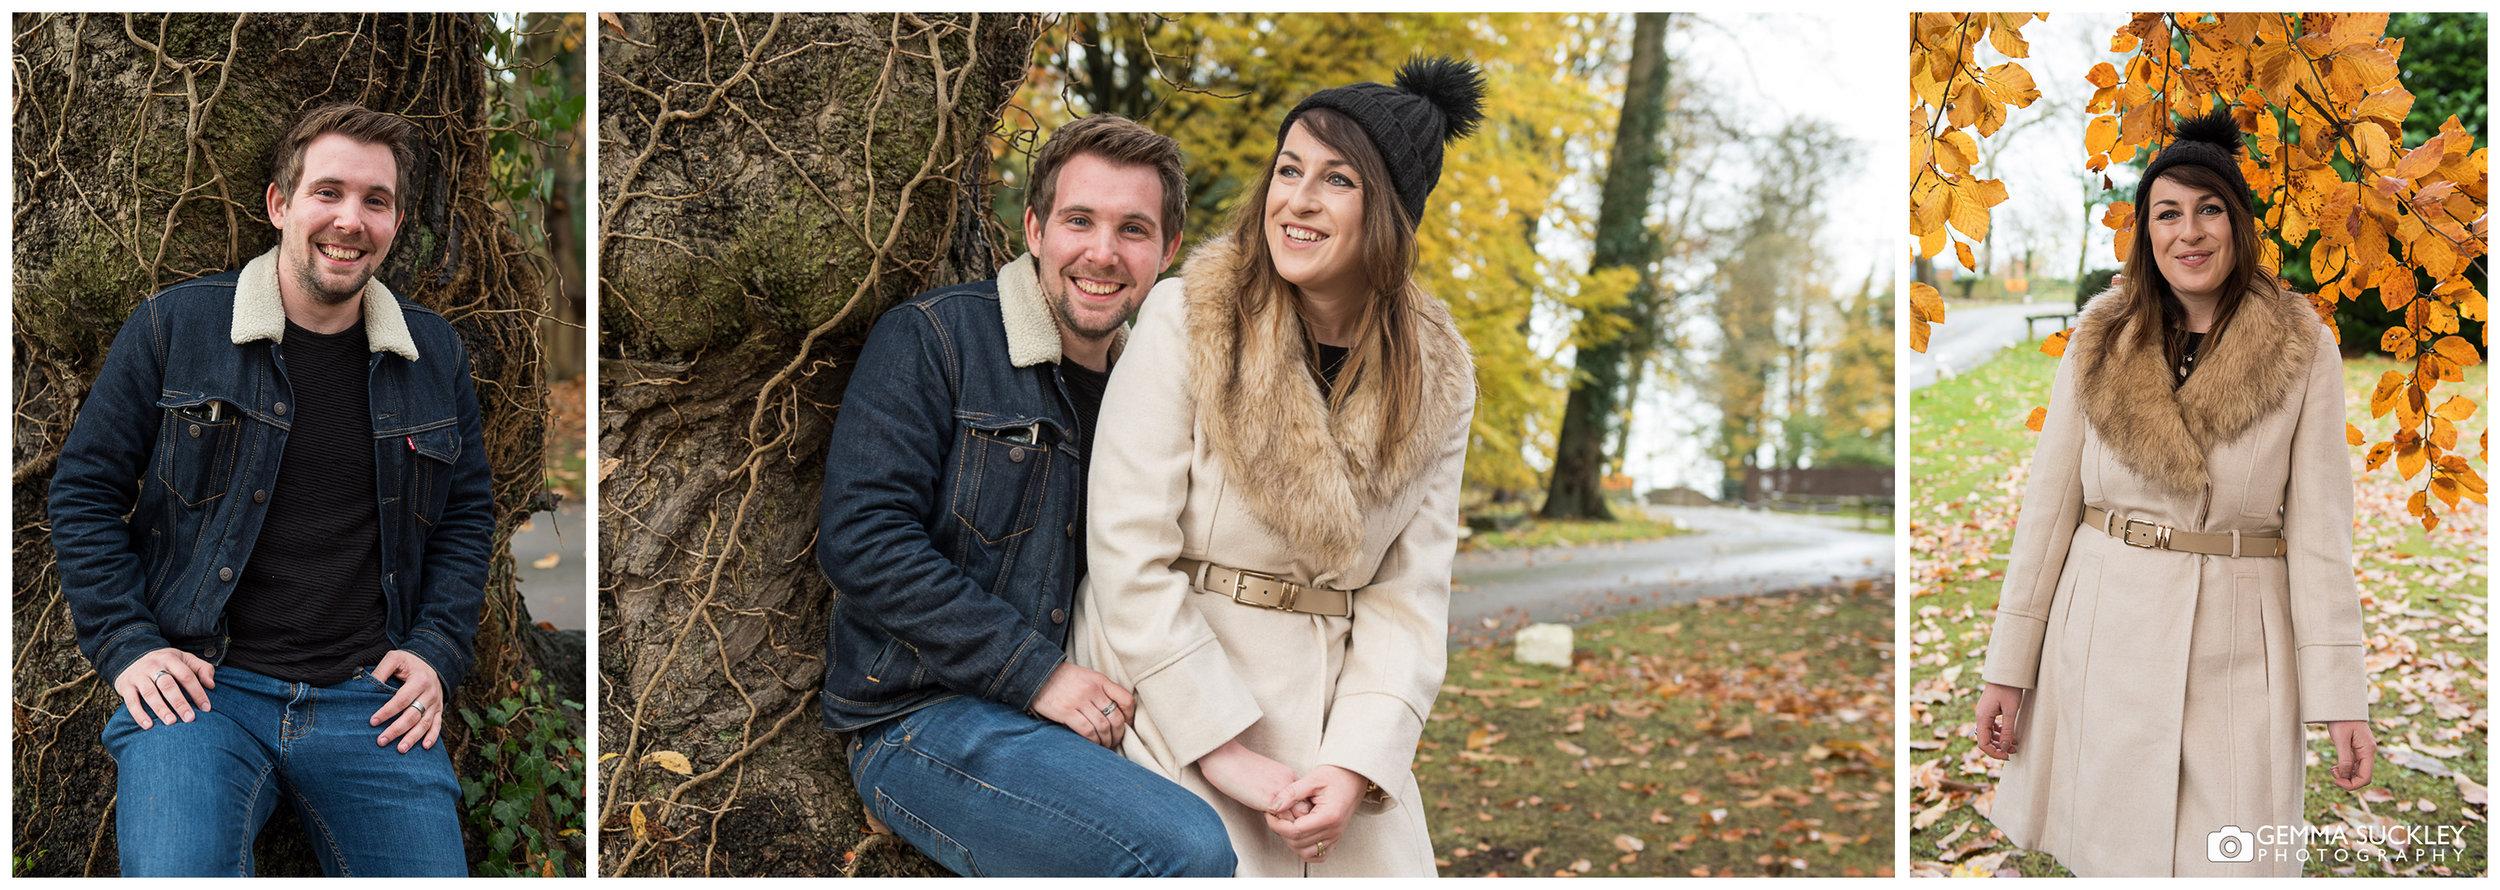 An engaged couple at Hazlewood castle